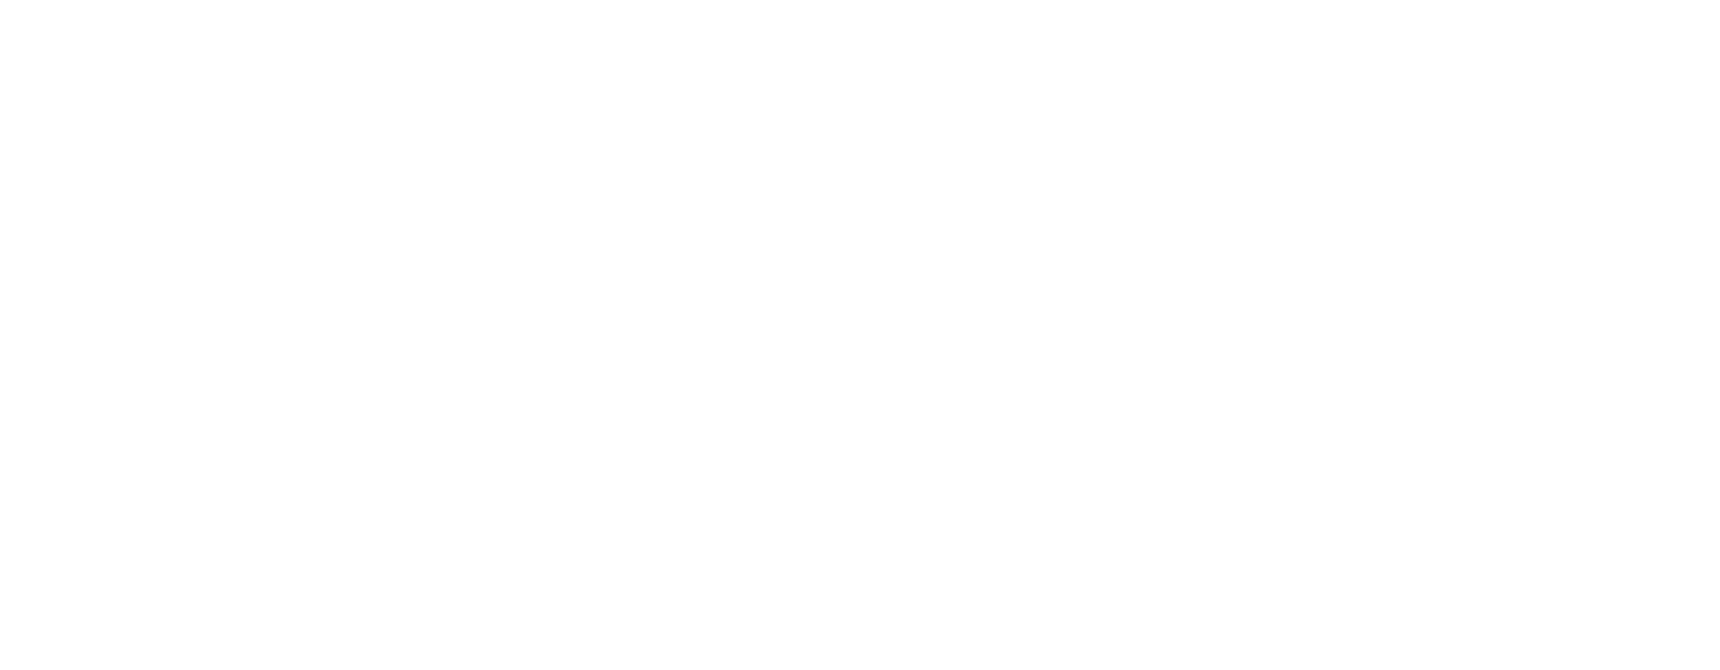 main-banner-empty